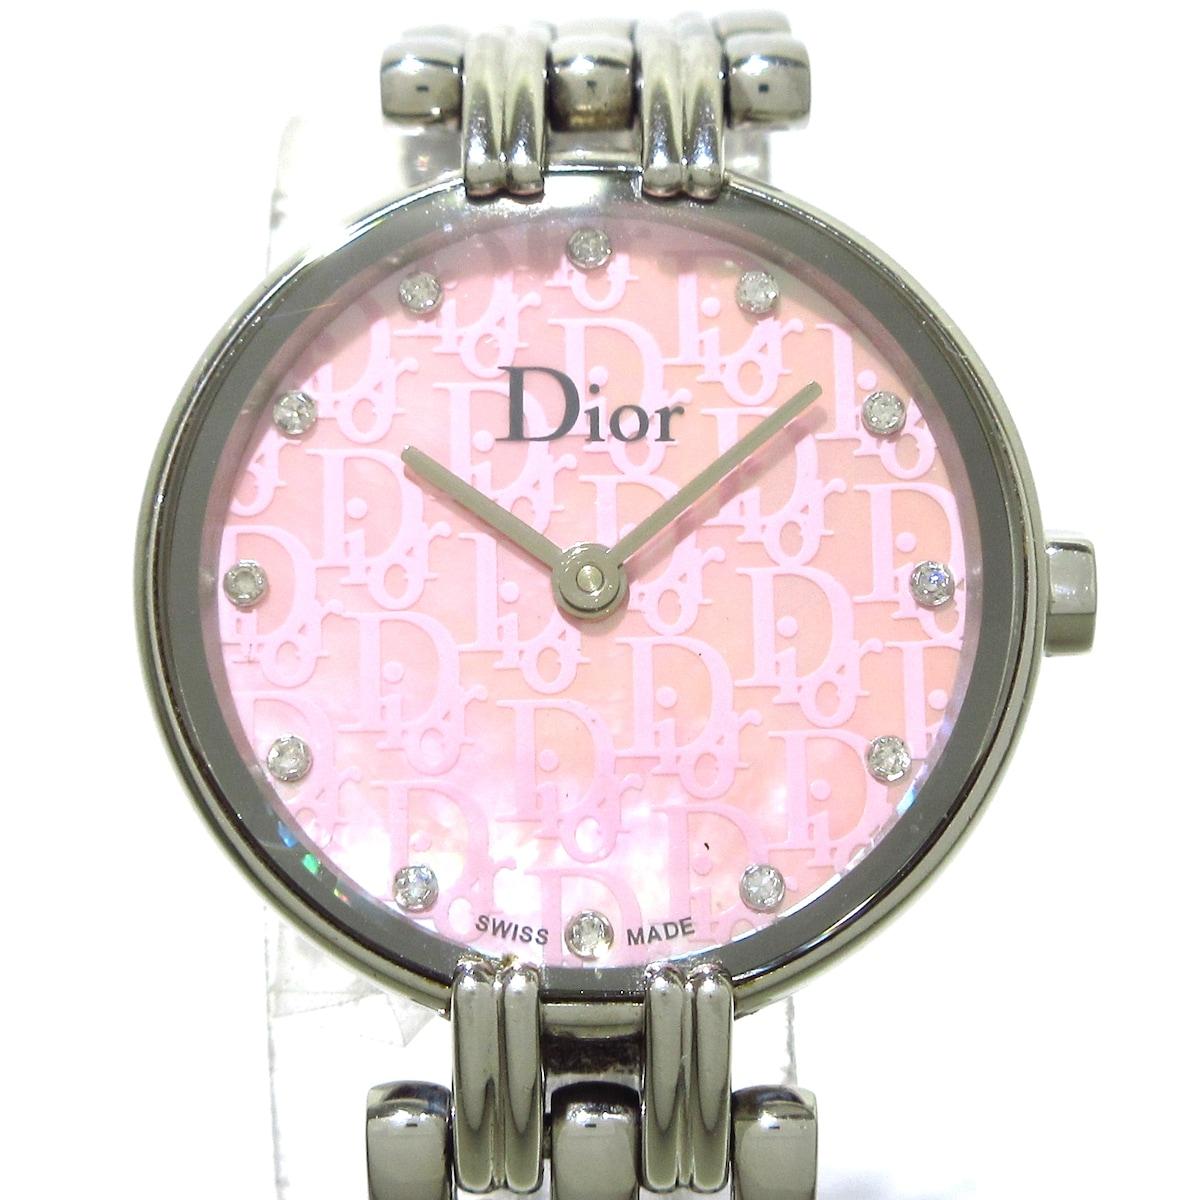 DIOR/ChristianDior(ディオール/クリスチャンディオール)のバキラ